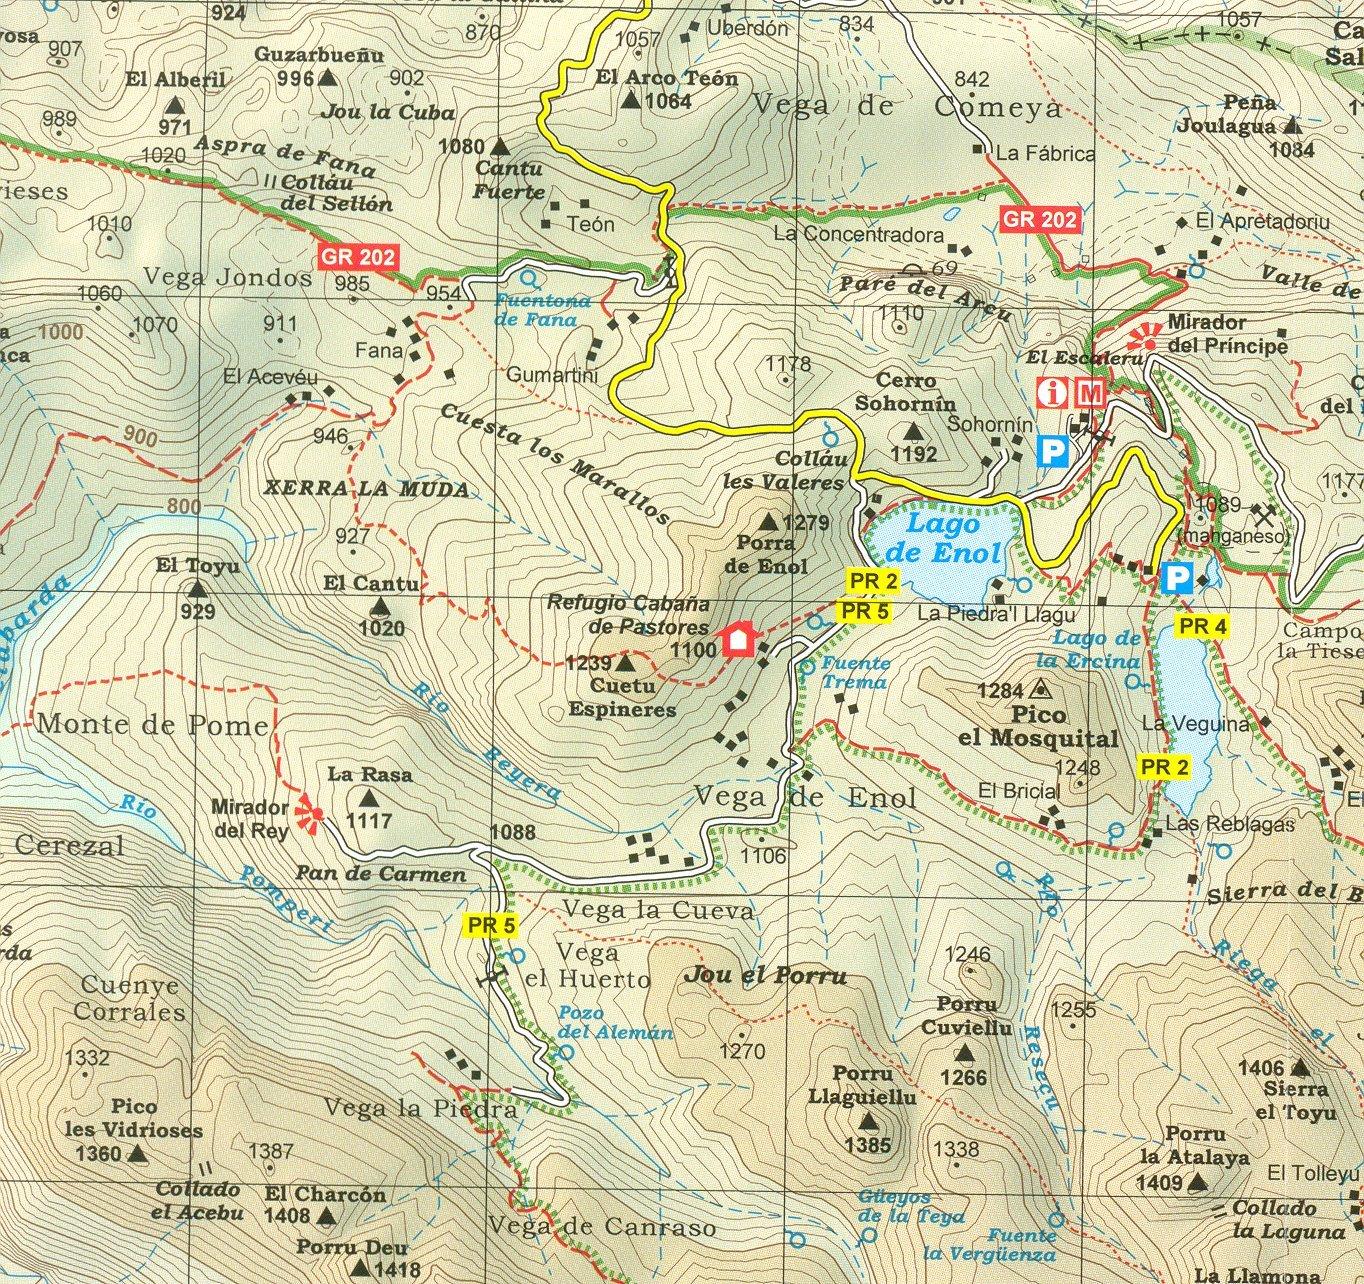 Picos de Europa Parque Nacional 1:40.000 conjunto de 2 mapas ...